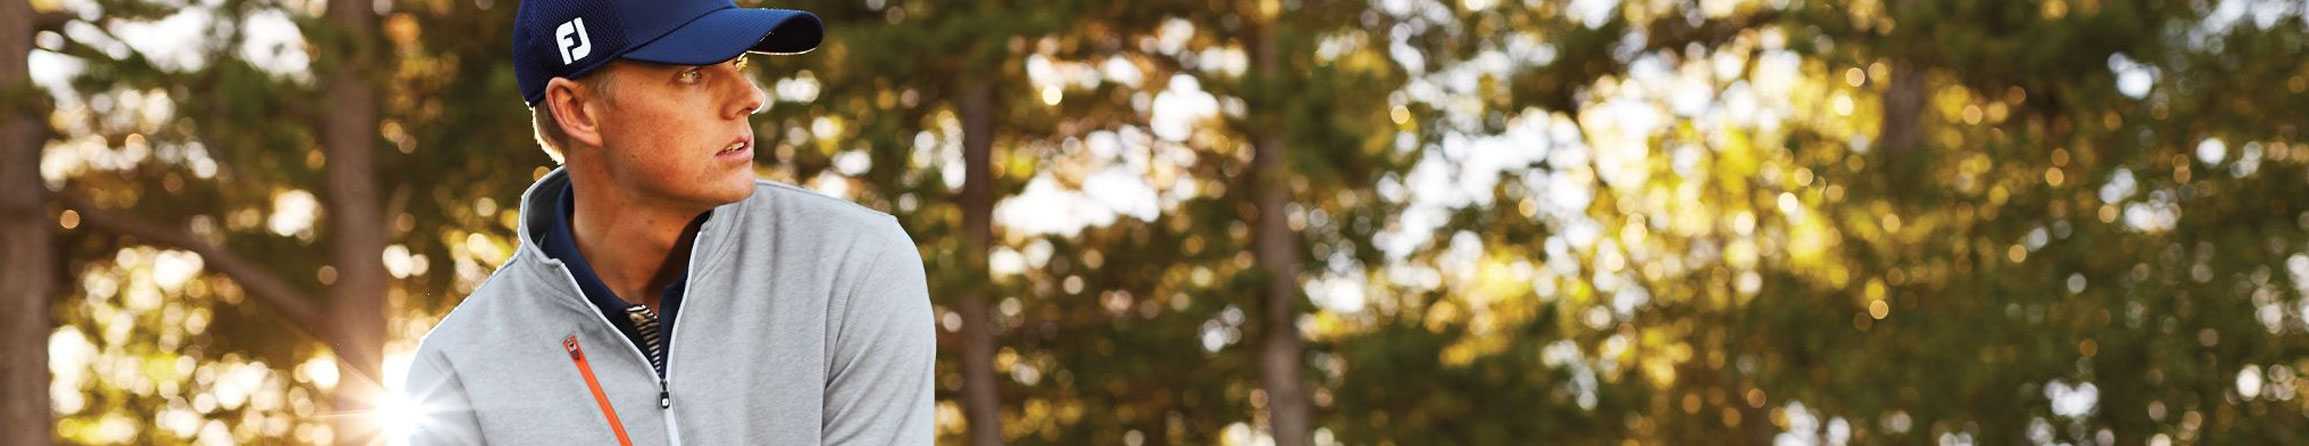 Dustin Johnson wearing Adidas Apparel